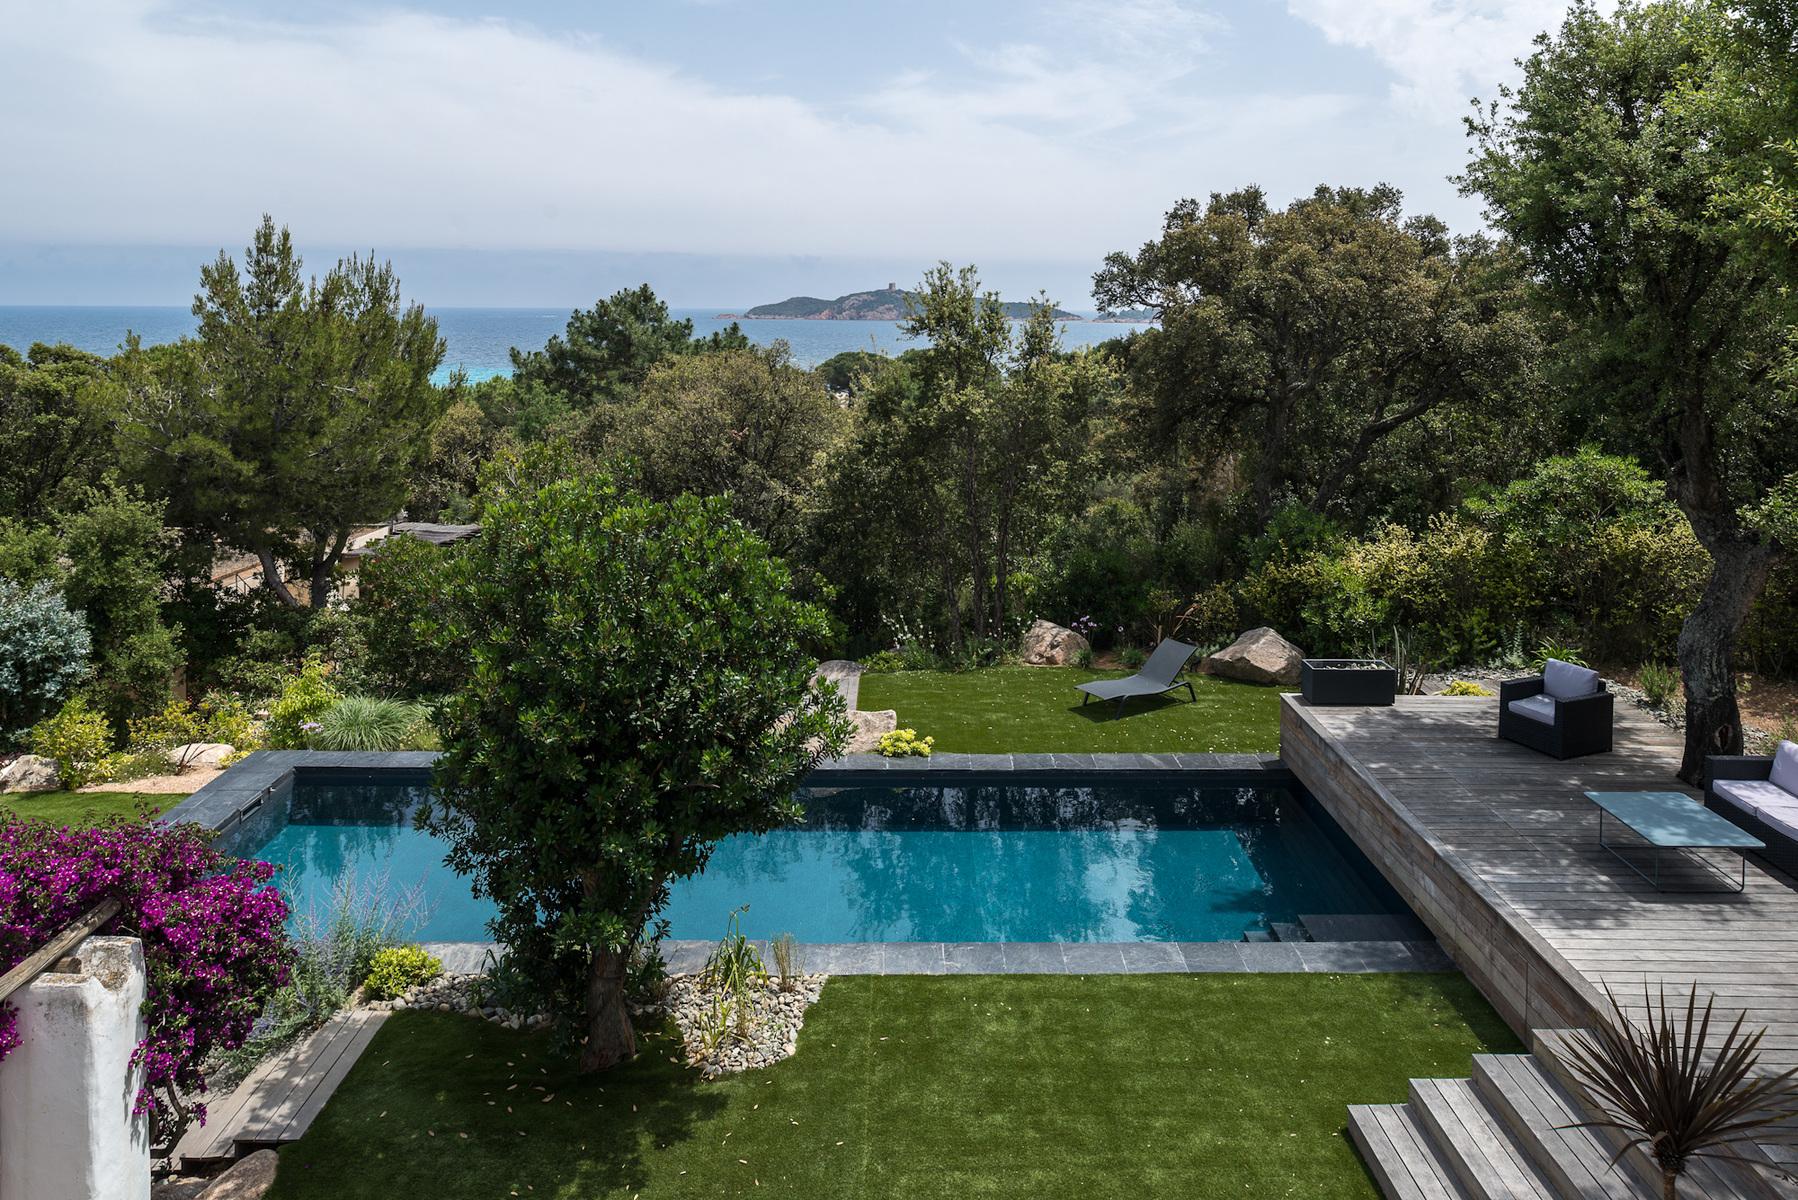 Fabien Delairon photographe - Piscine Vert Turquoise en Corse